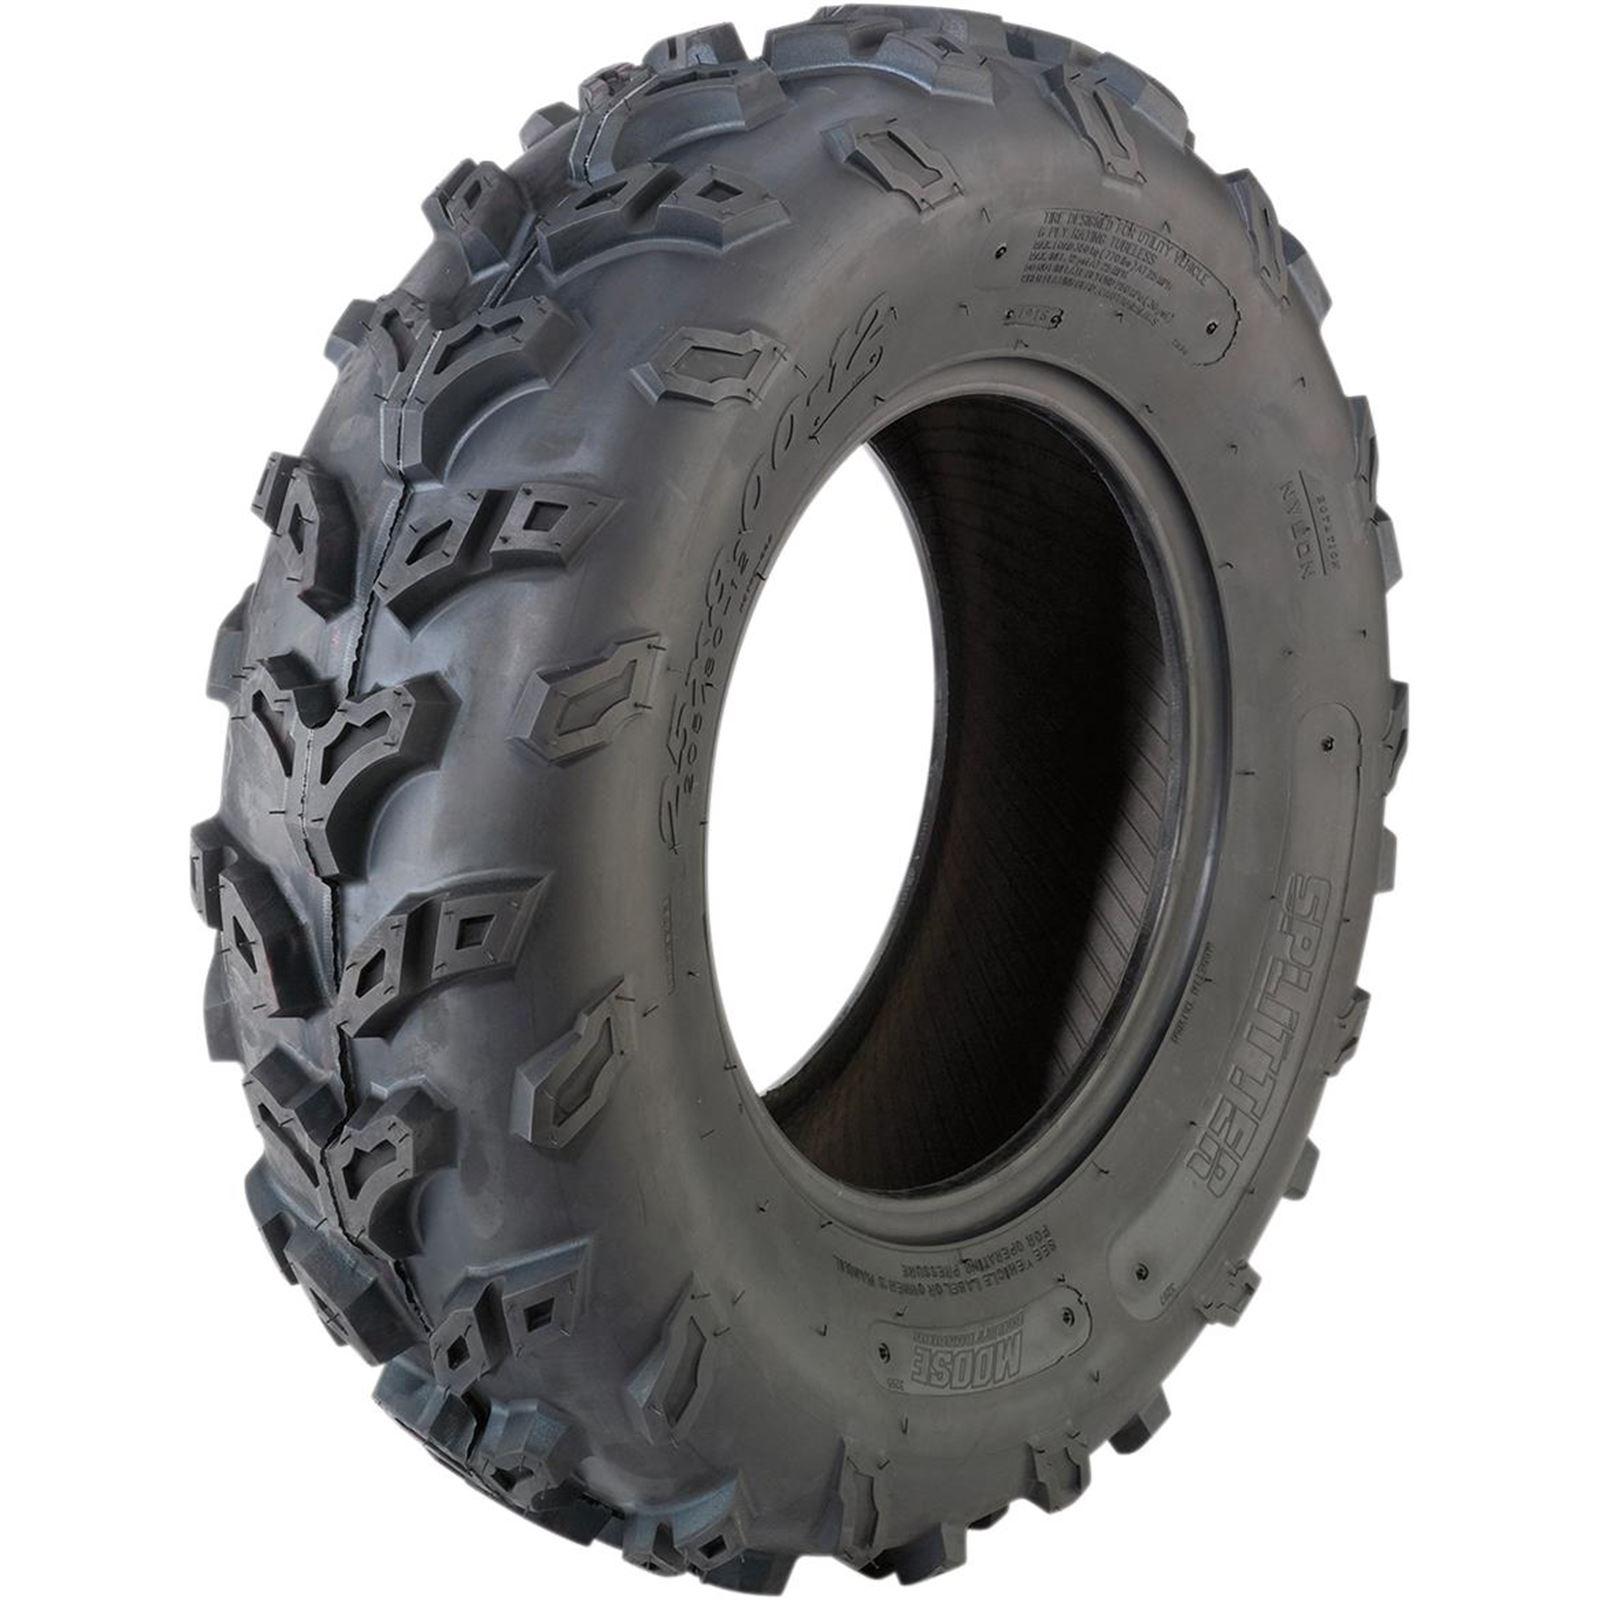 Moose Tire - Splitter - 26X9-12 6P